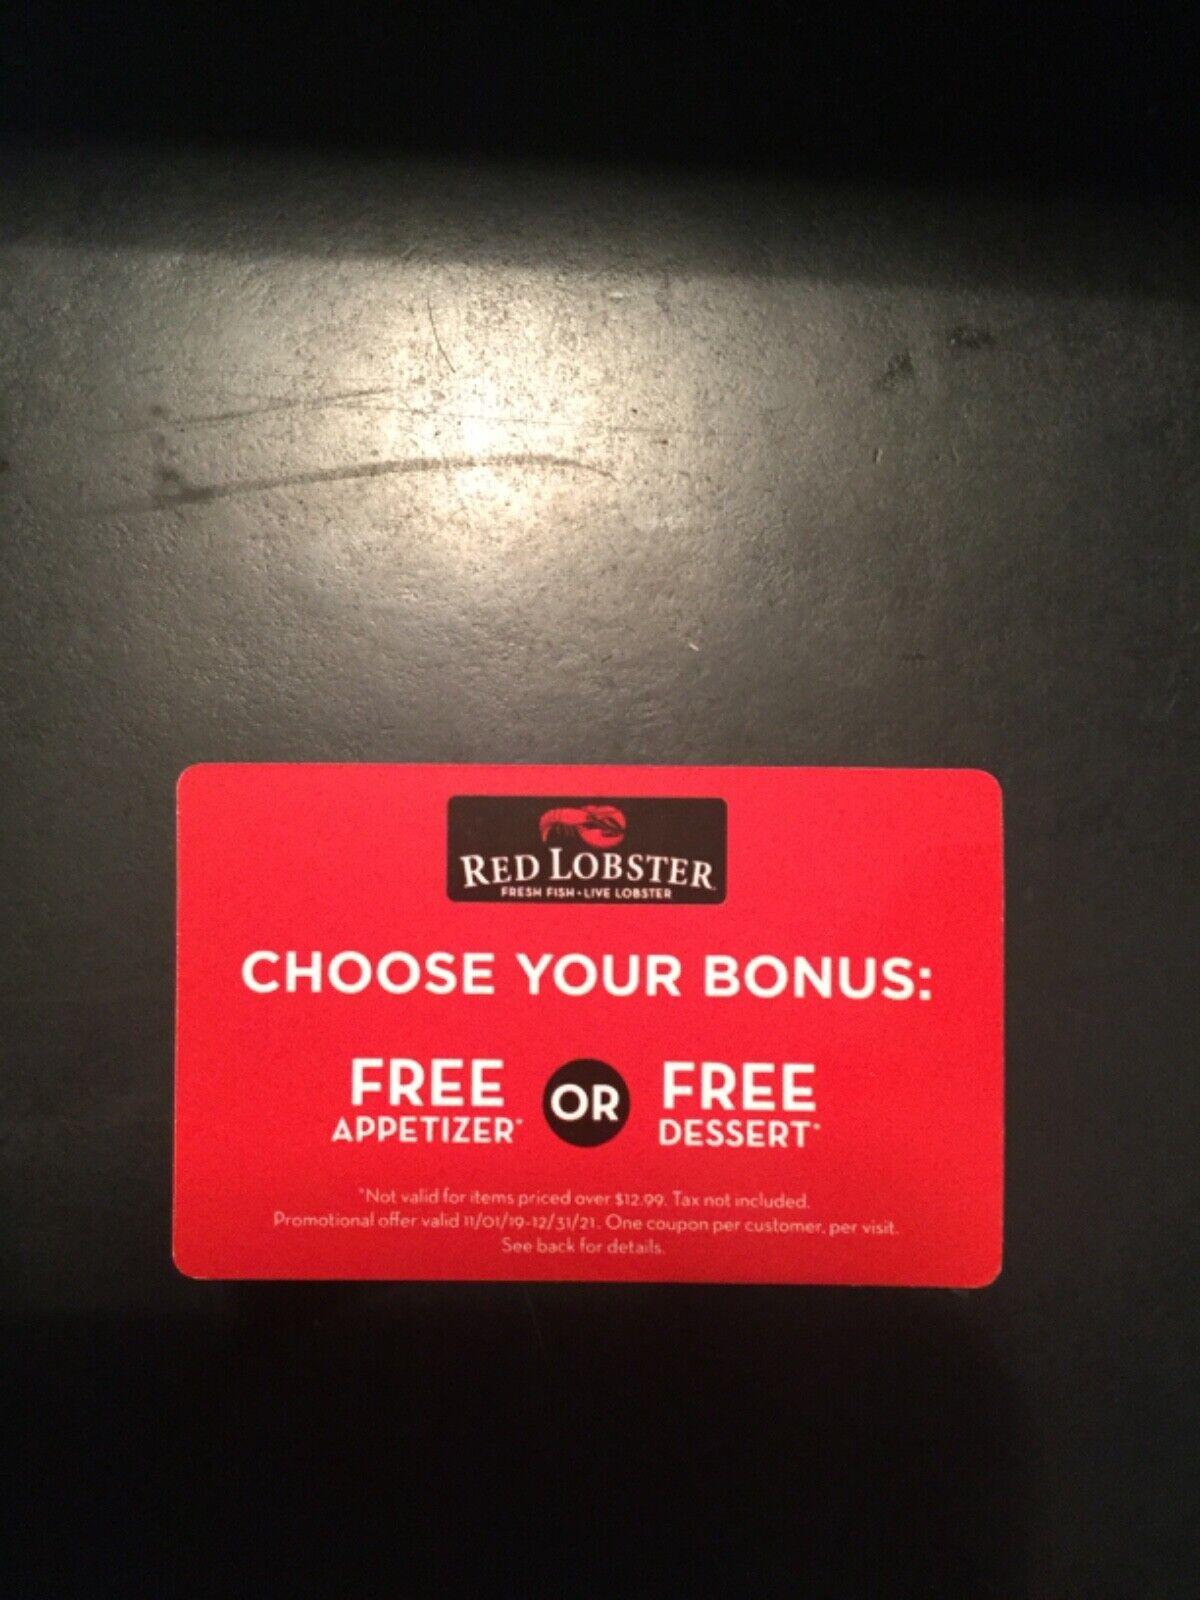 5 Red Lobster Free Appetizer Or Dessert Gift Cards 64.95 Value 12/31/21 EXP - $27.99